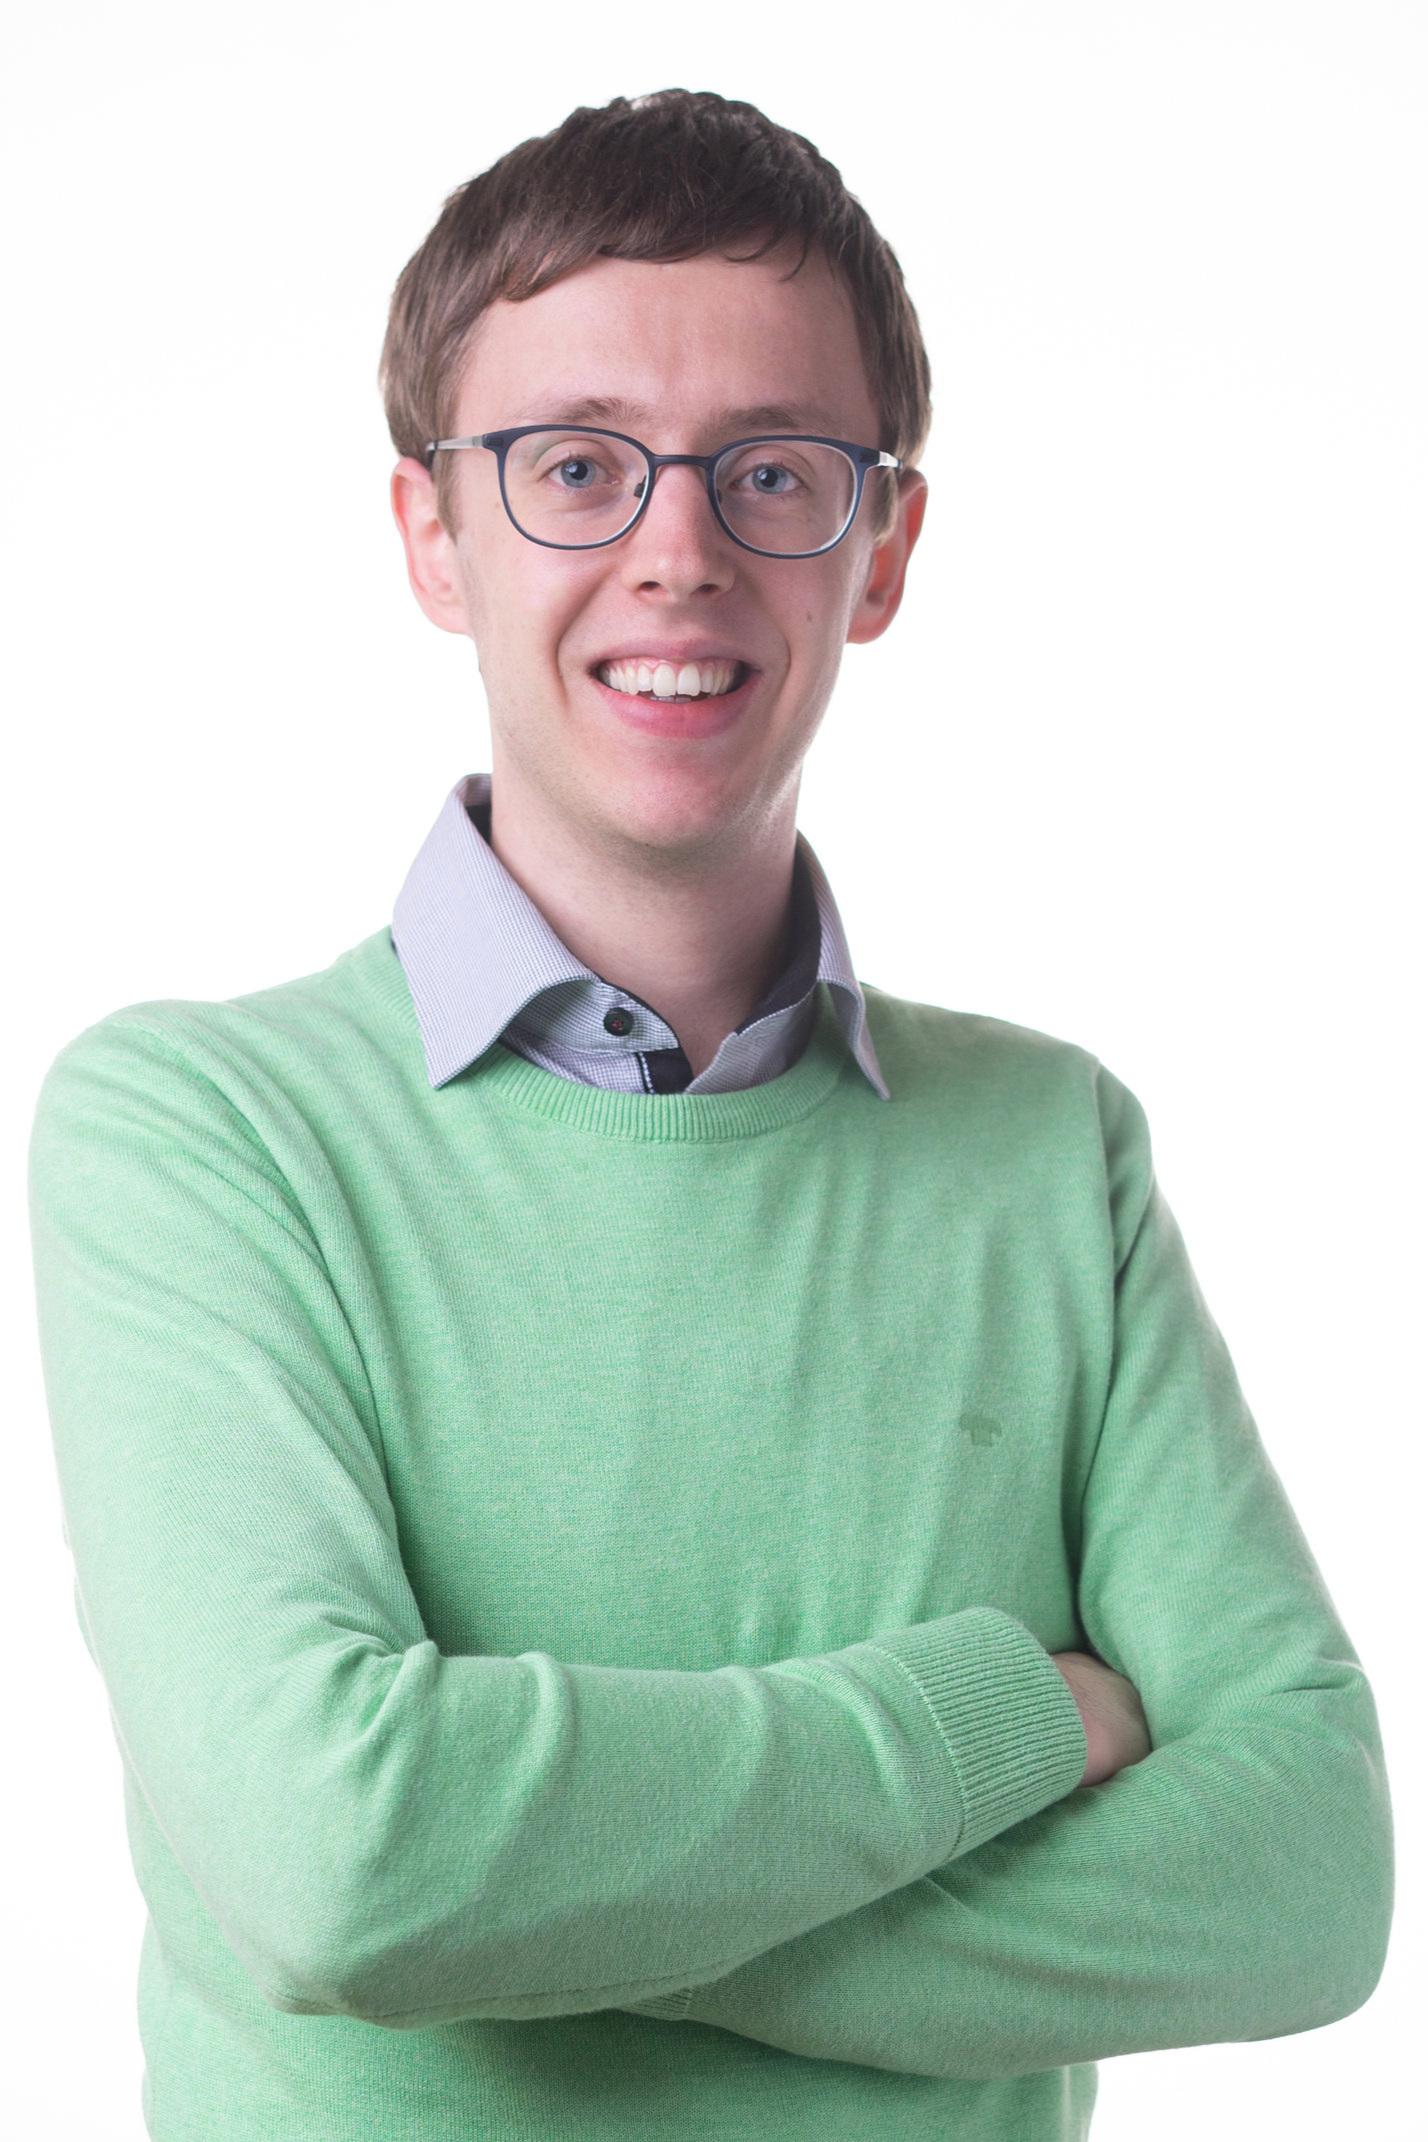 Michael WIENEROITER   8. Semester Humanmedizin  ÖH-Vorsitzender  (ehem. Generalsekretär der ÖH)